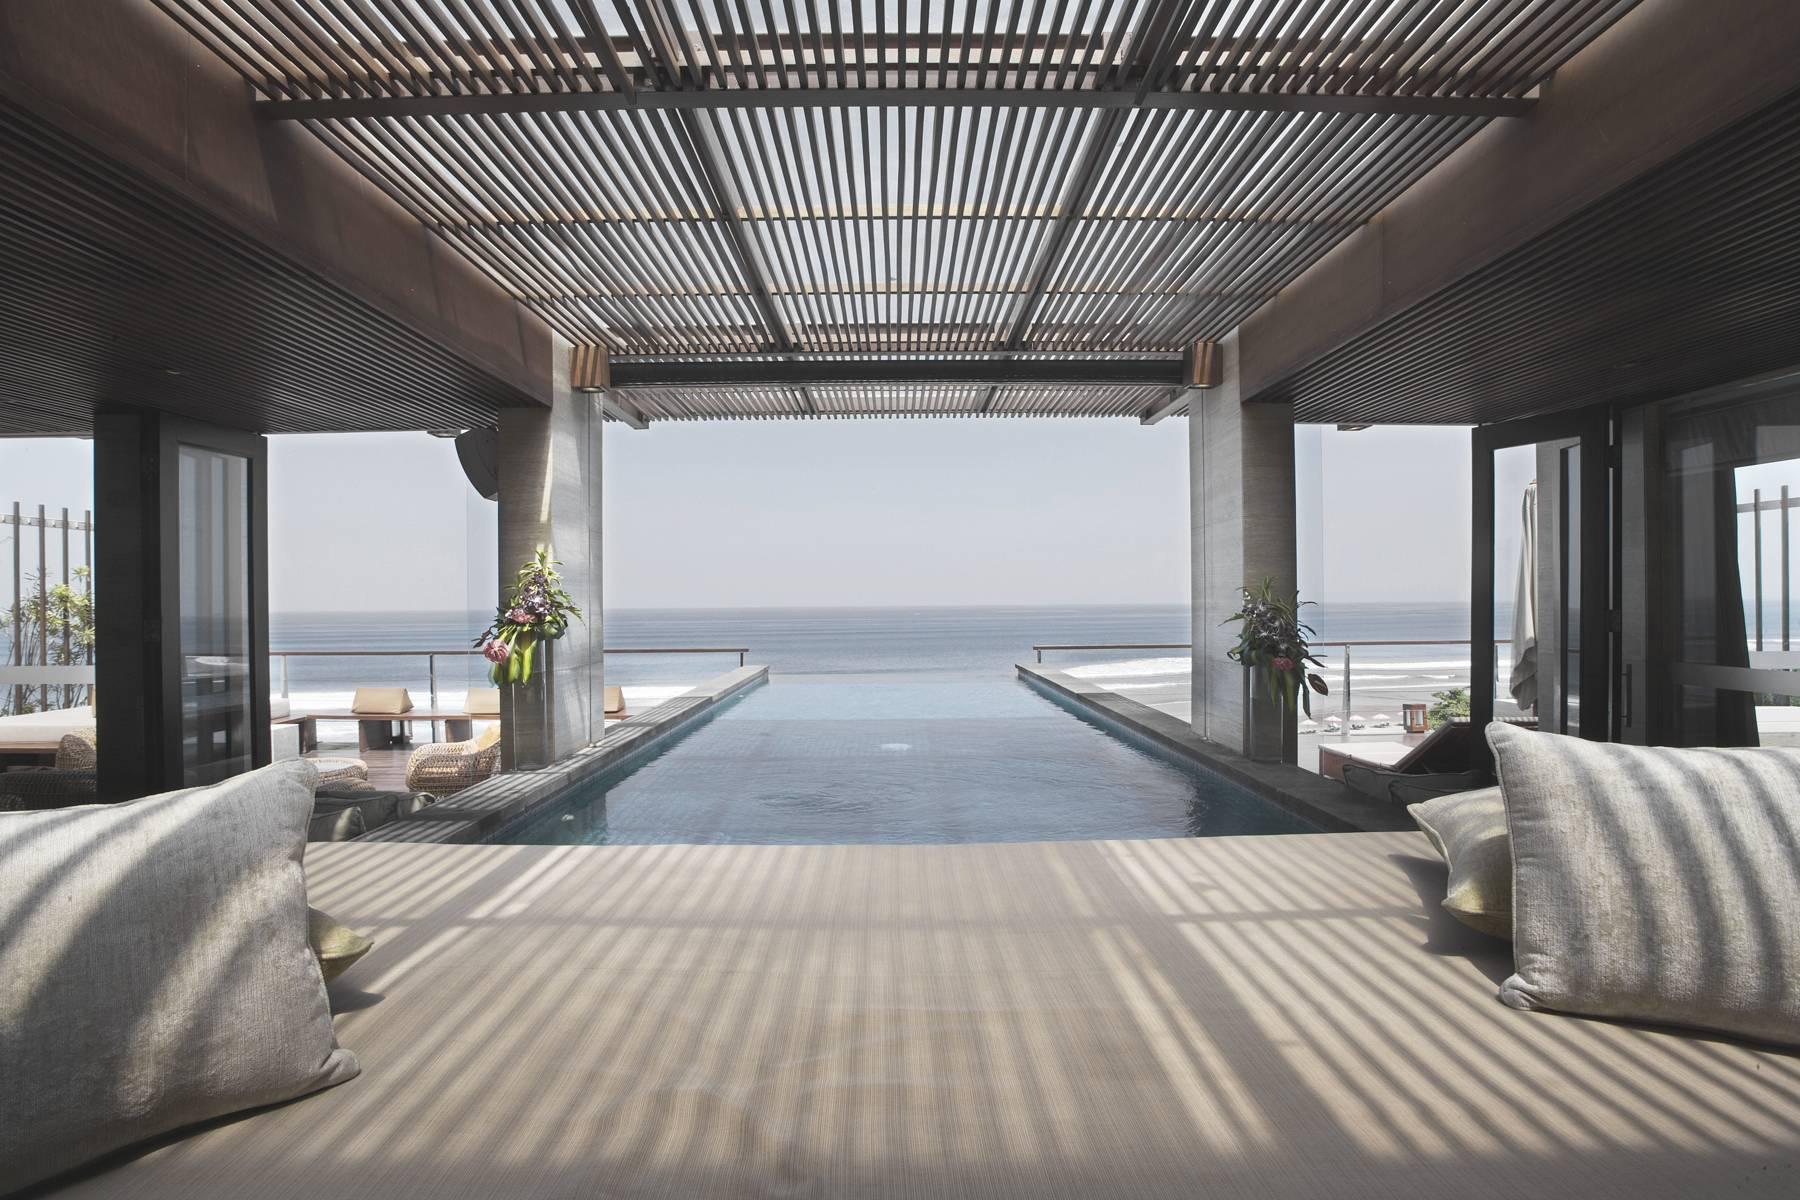 Antony Liu + Ferry Ridwan / Studio Tonton Anantara Seminyak Bali Resort Seminyak, Bali, Indonesia Seminyak, Bali, Indonesia Pool View Modern  8034